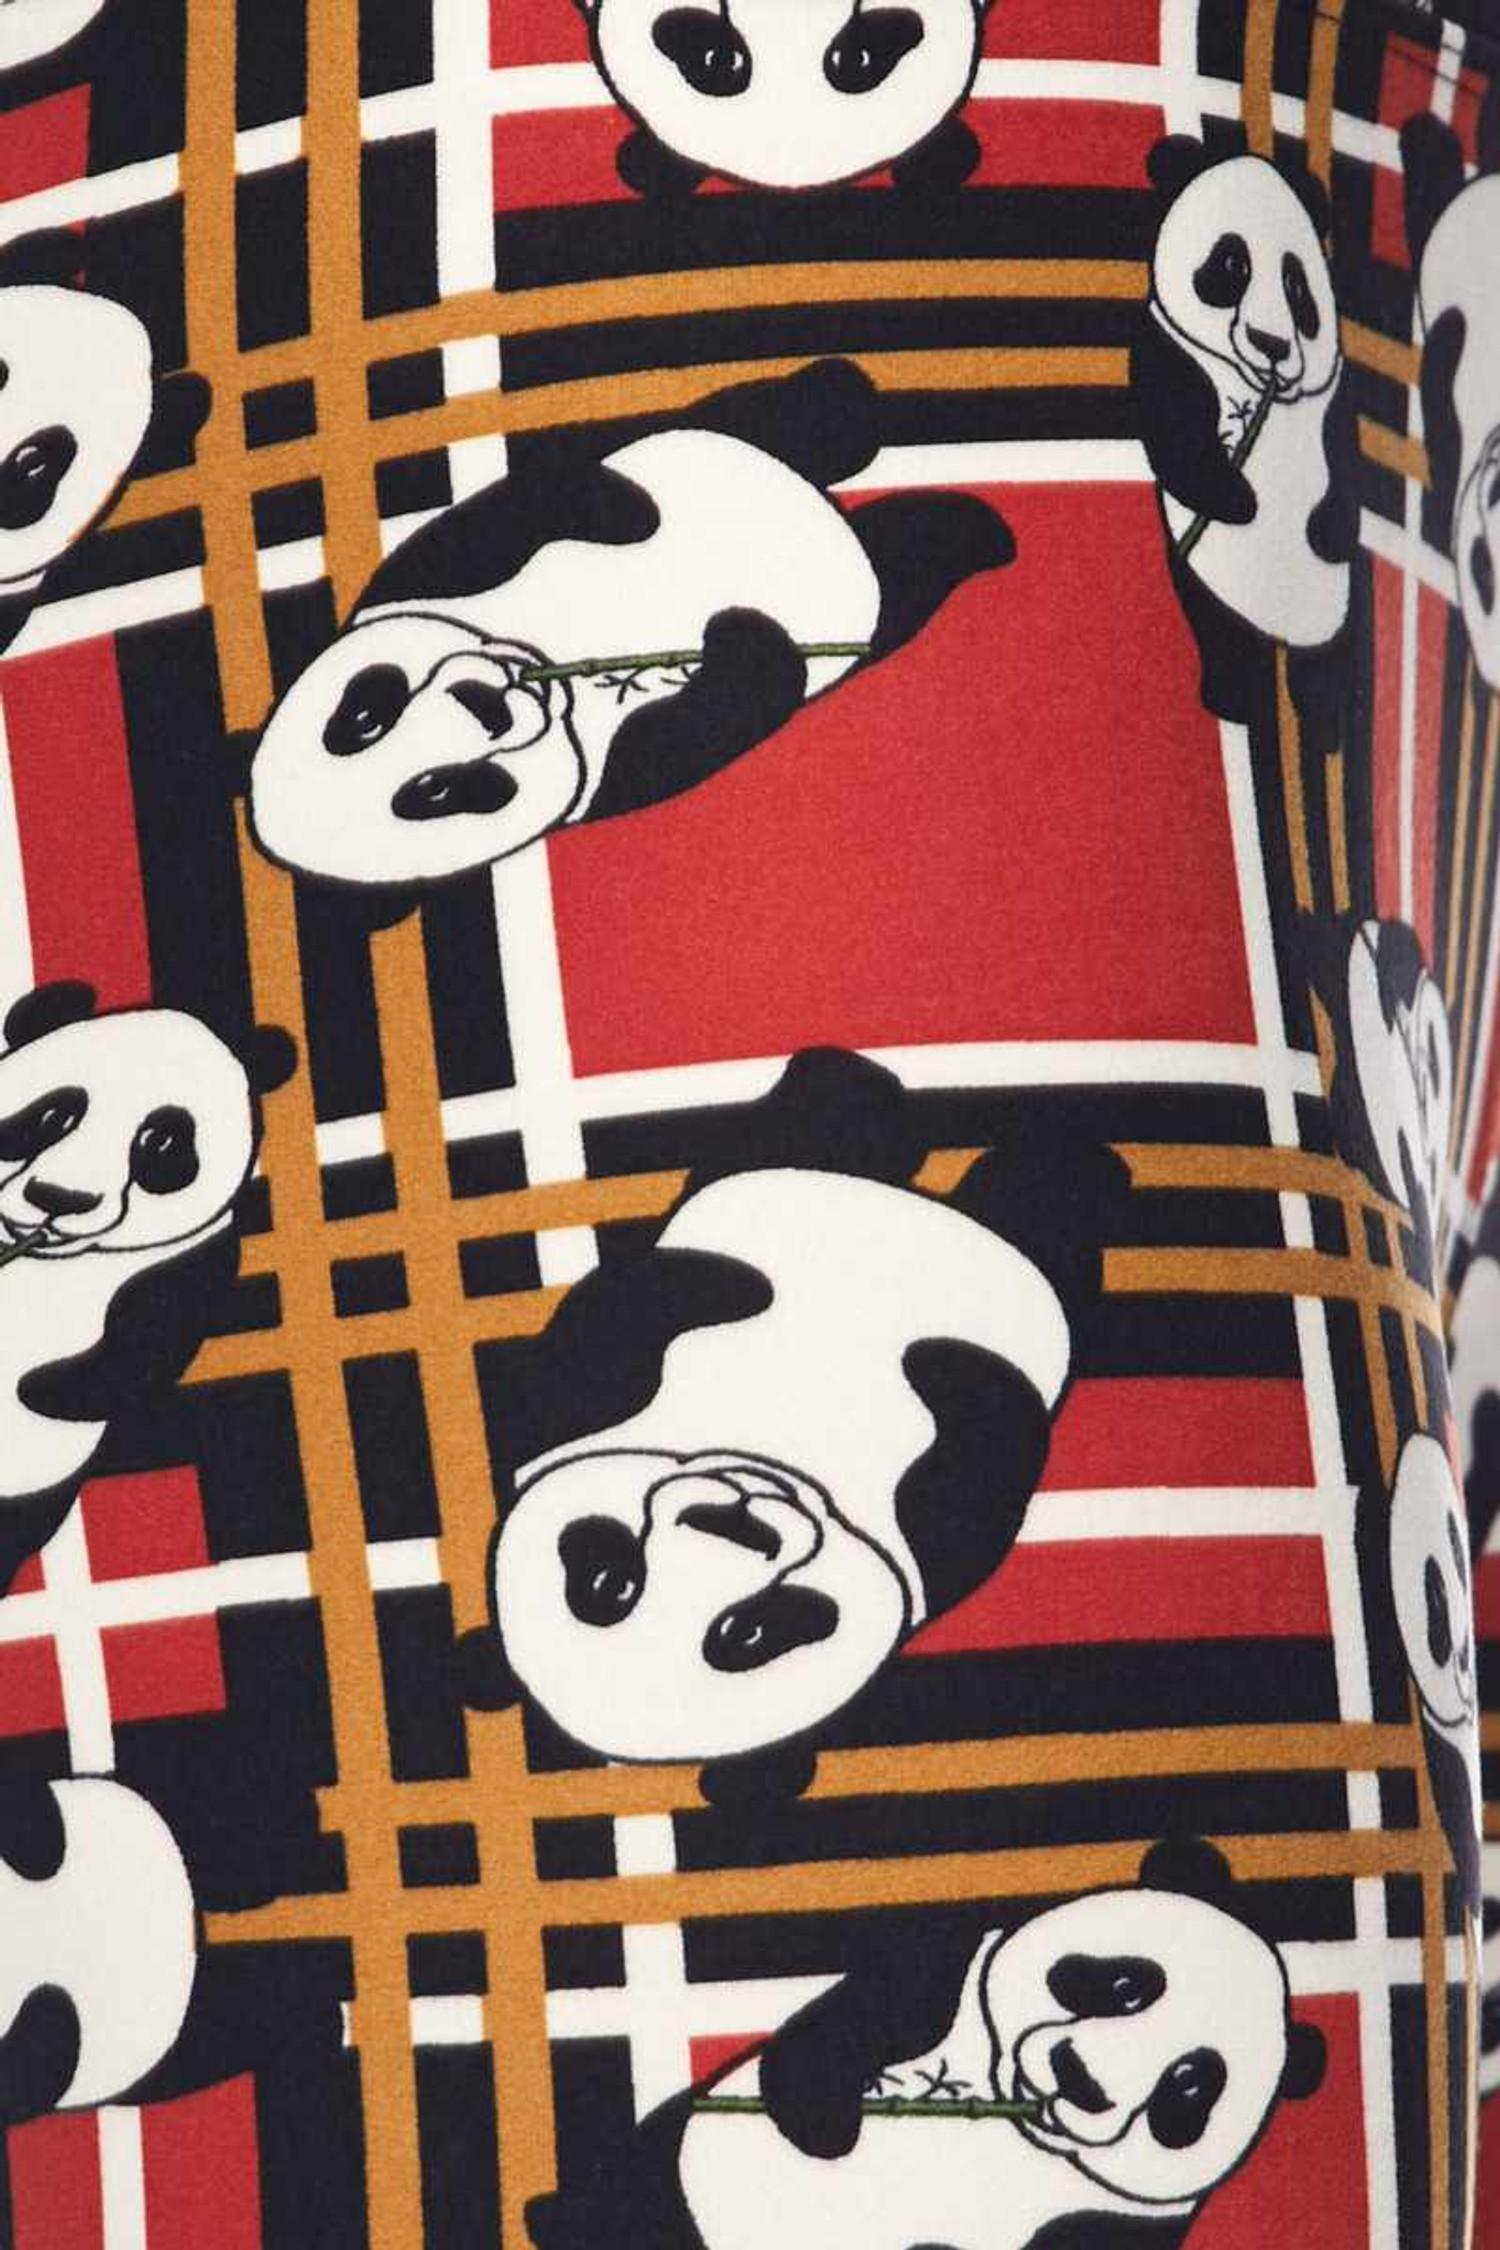 Brushed Plaid Panda High Waisted Leggings